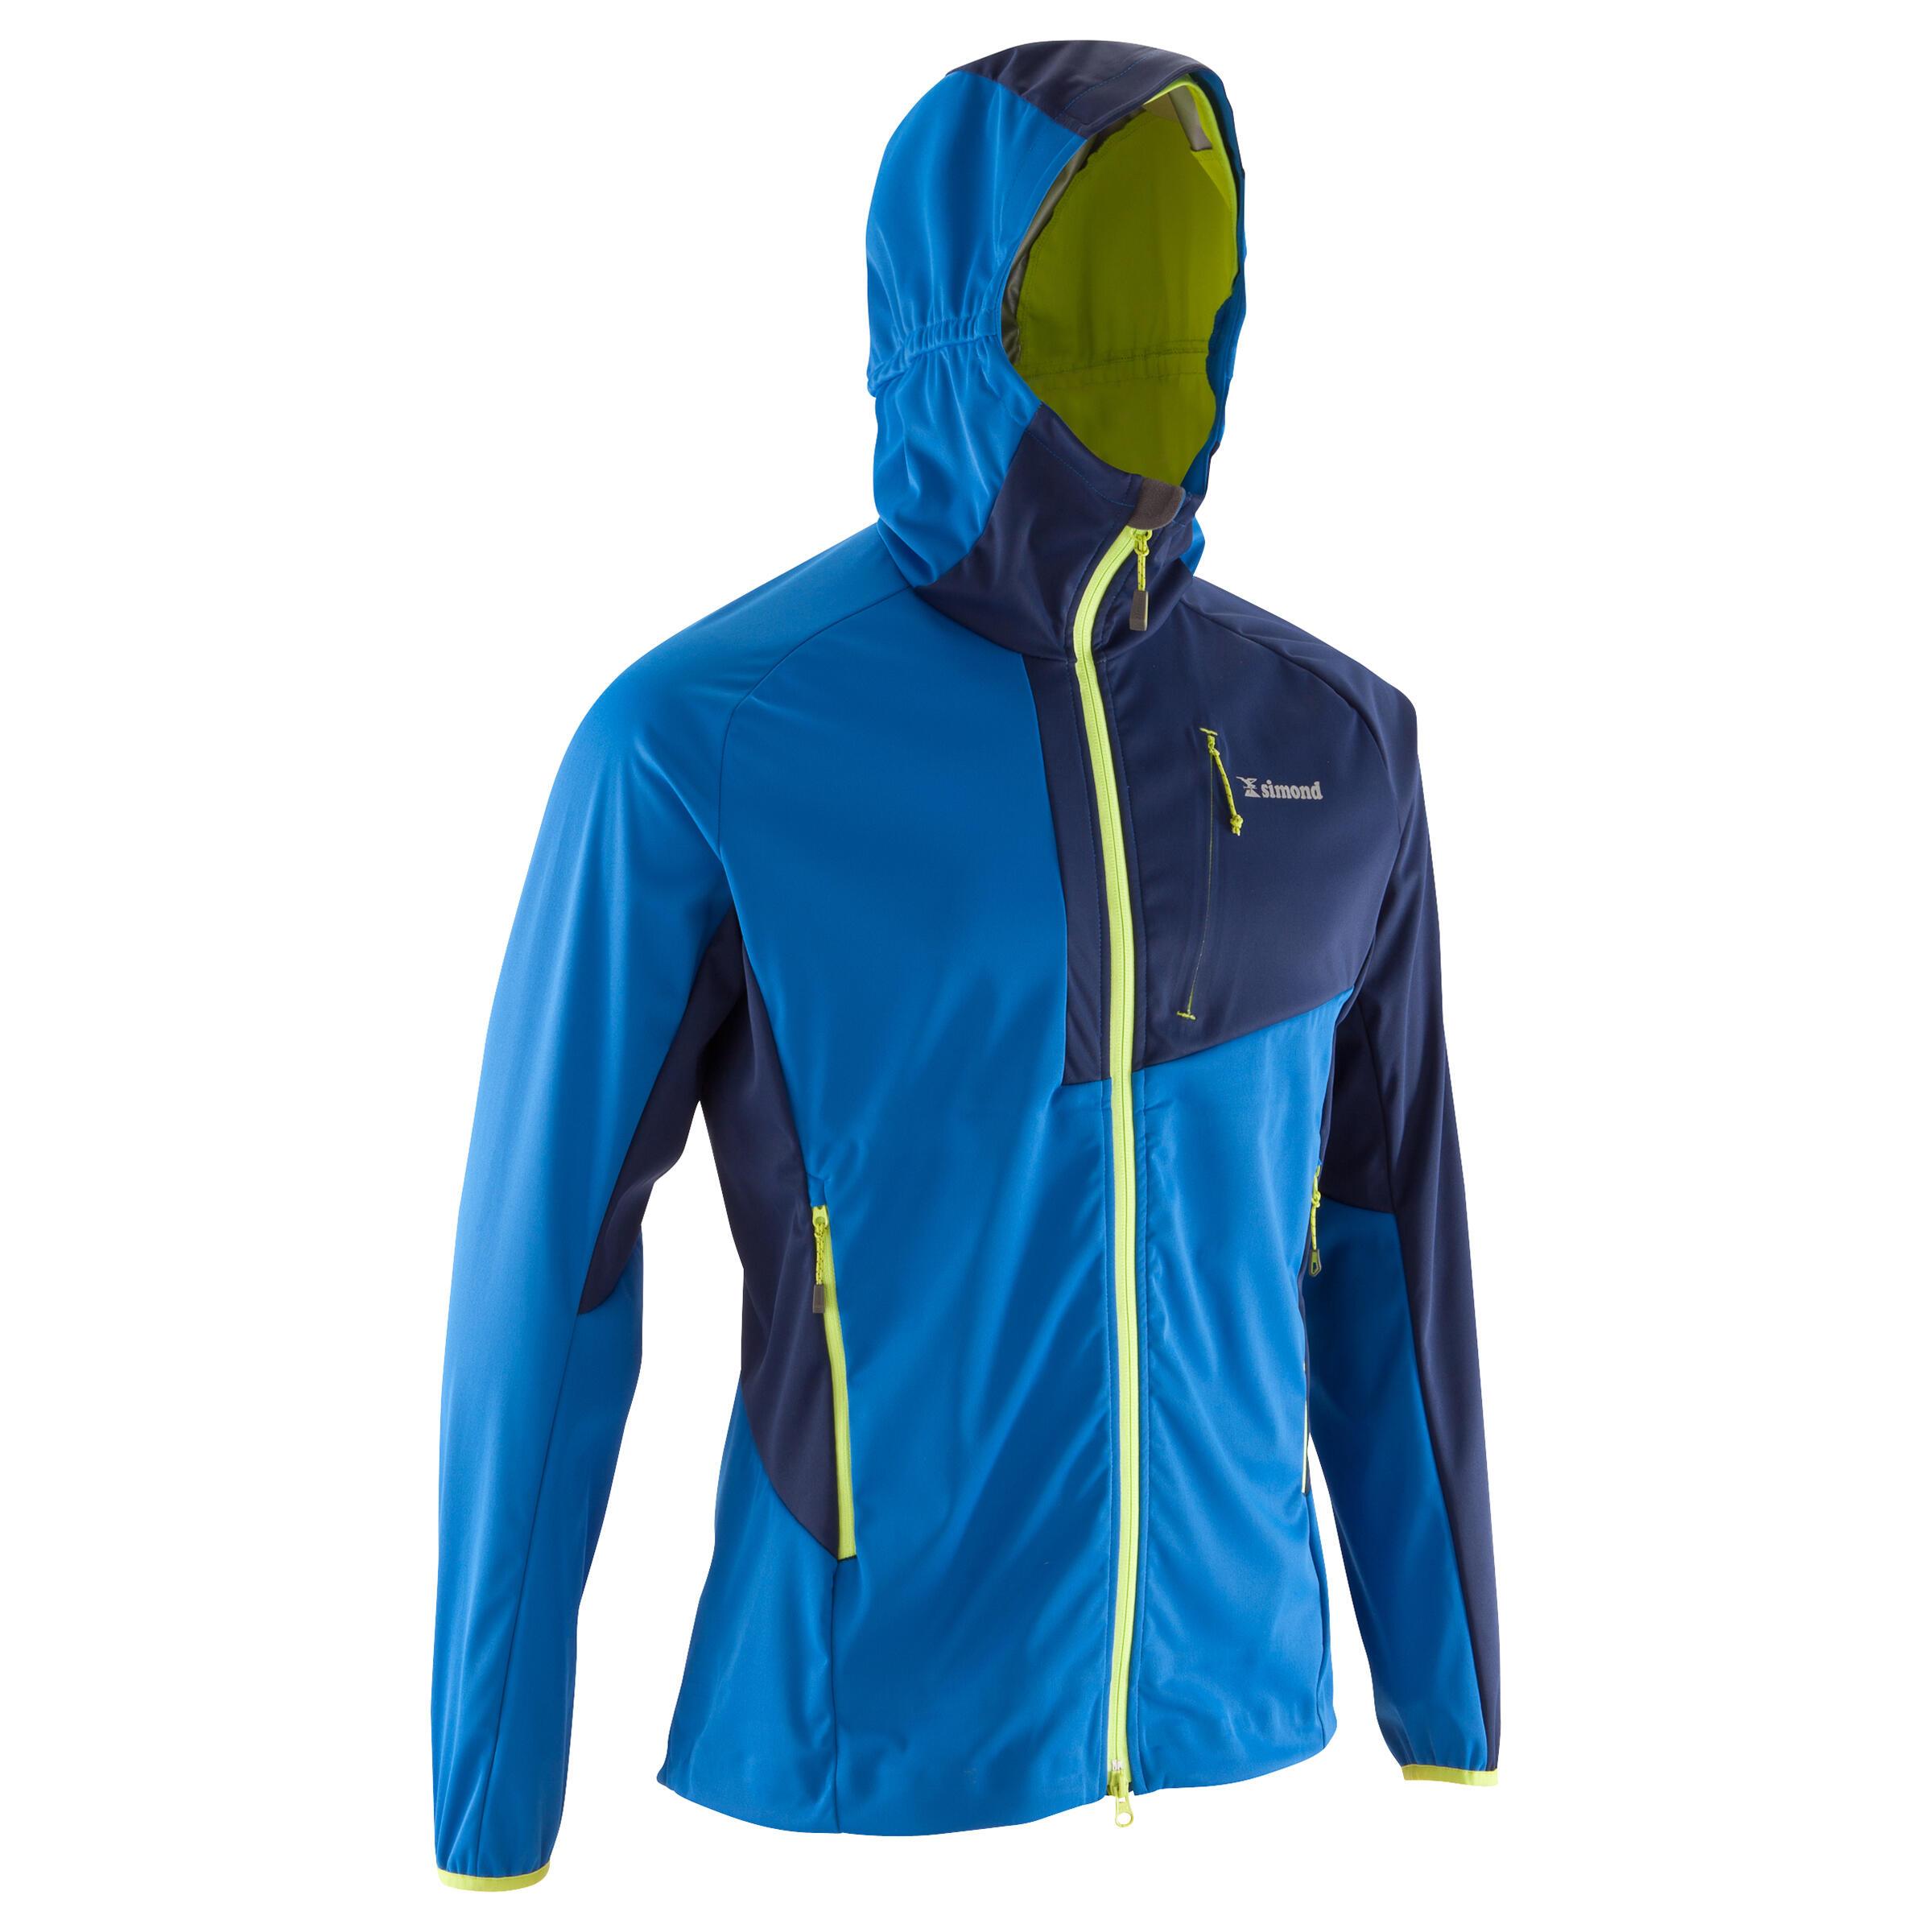 Jachetă Softshell Alpinism